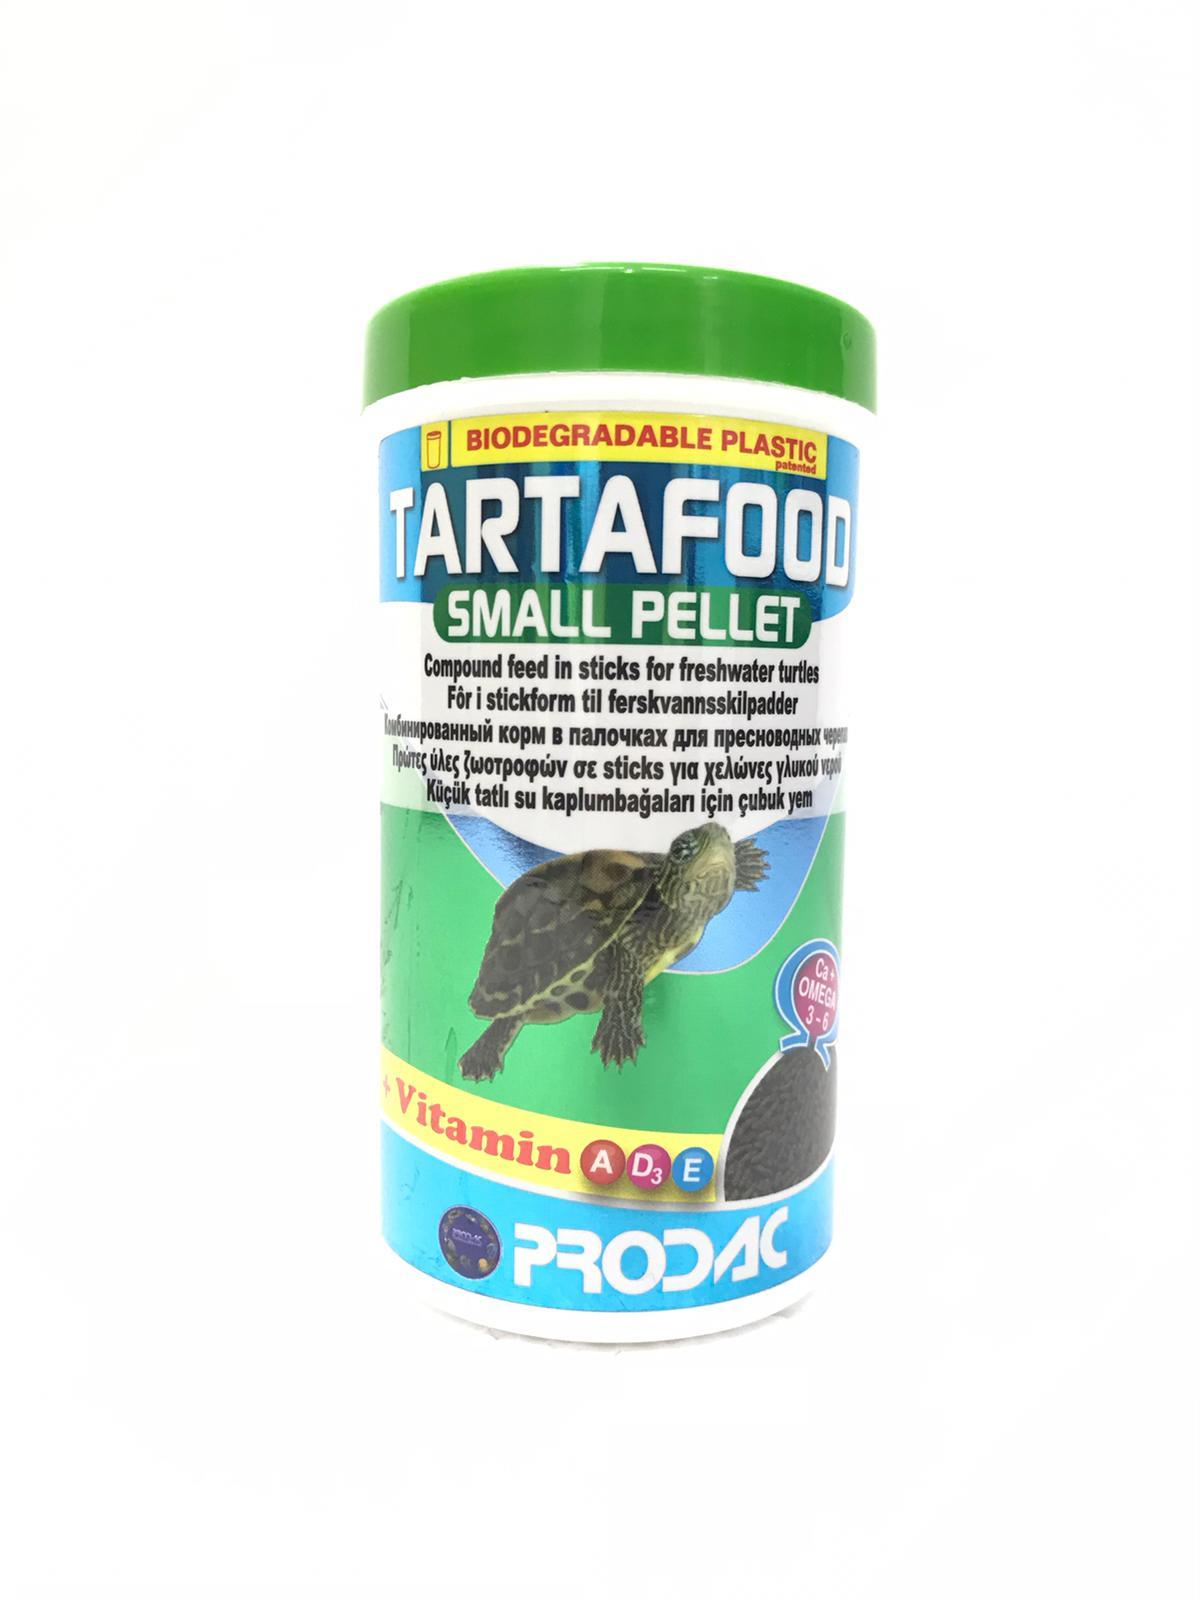 Prodac Tartafood Small Pellet